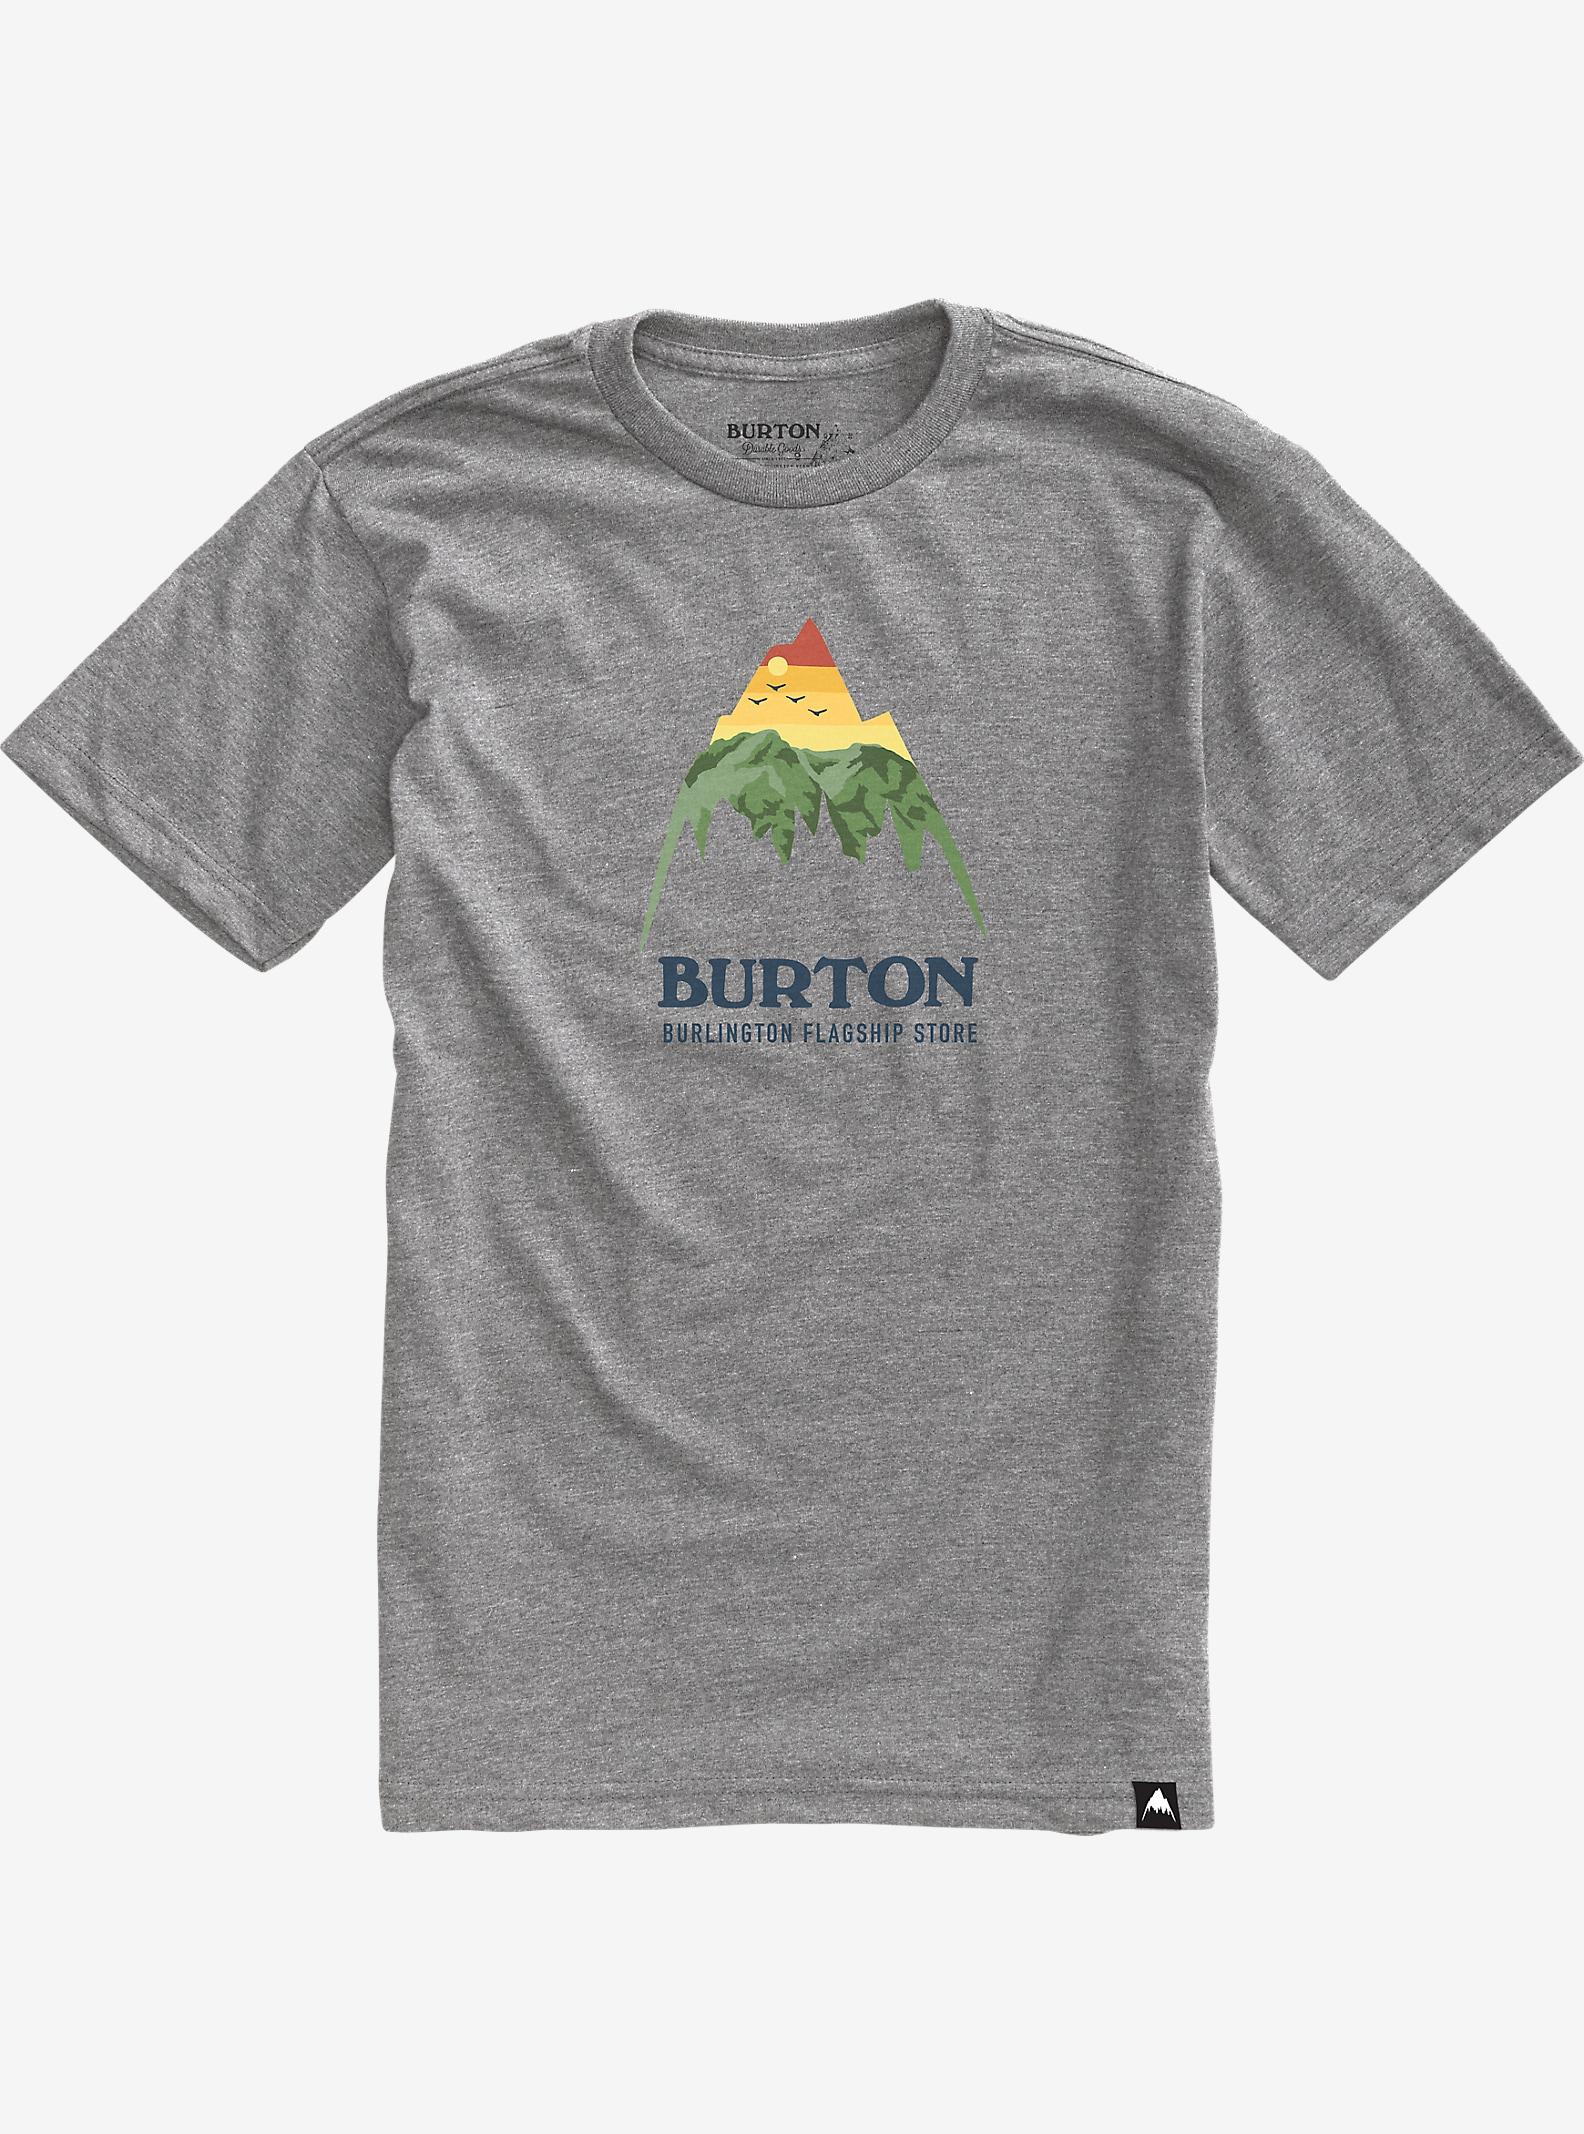 Burton City Classic Mountain T Shirt shown in Burlington Gray Heather